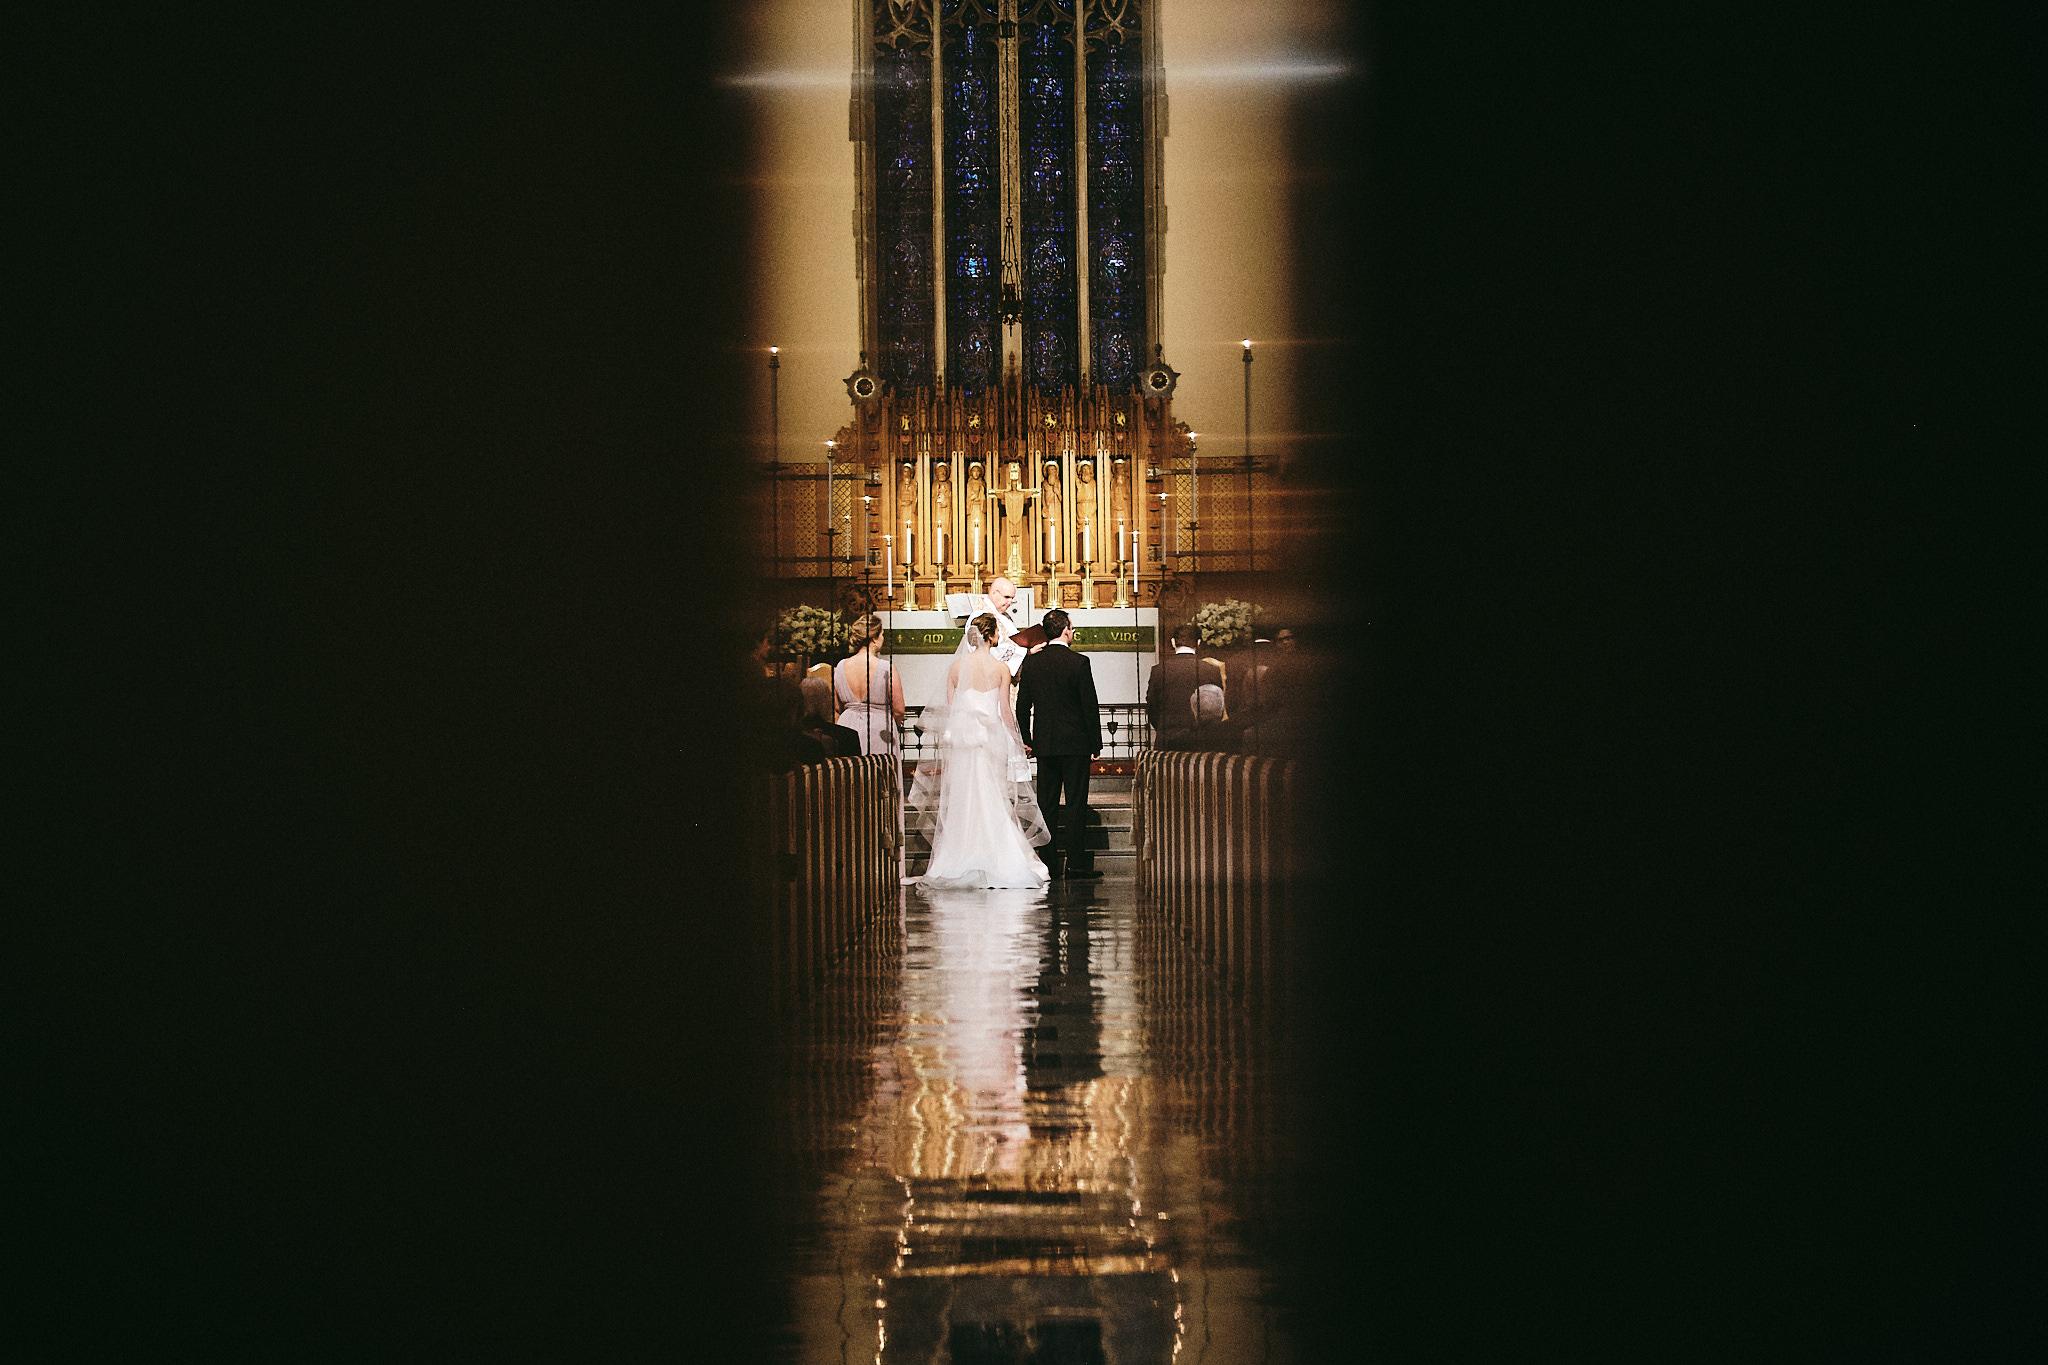 Lutheran Church of the Redeemer Atlanta wedding ceremony